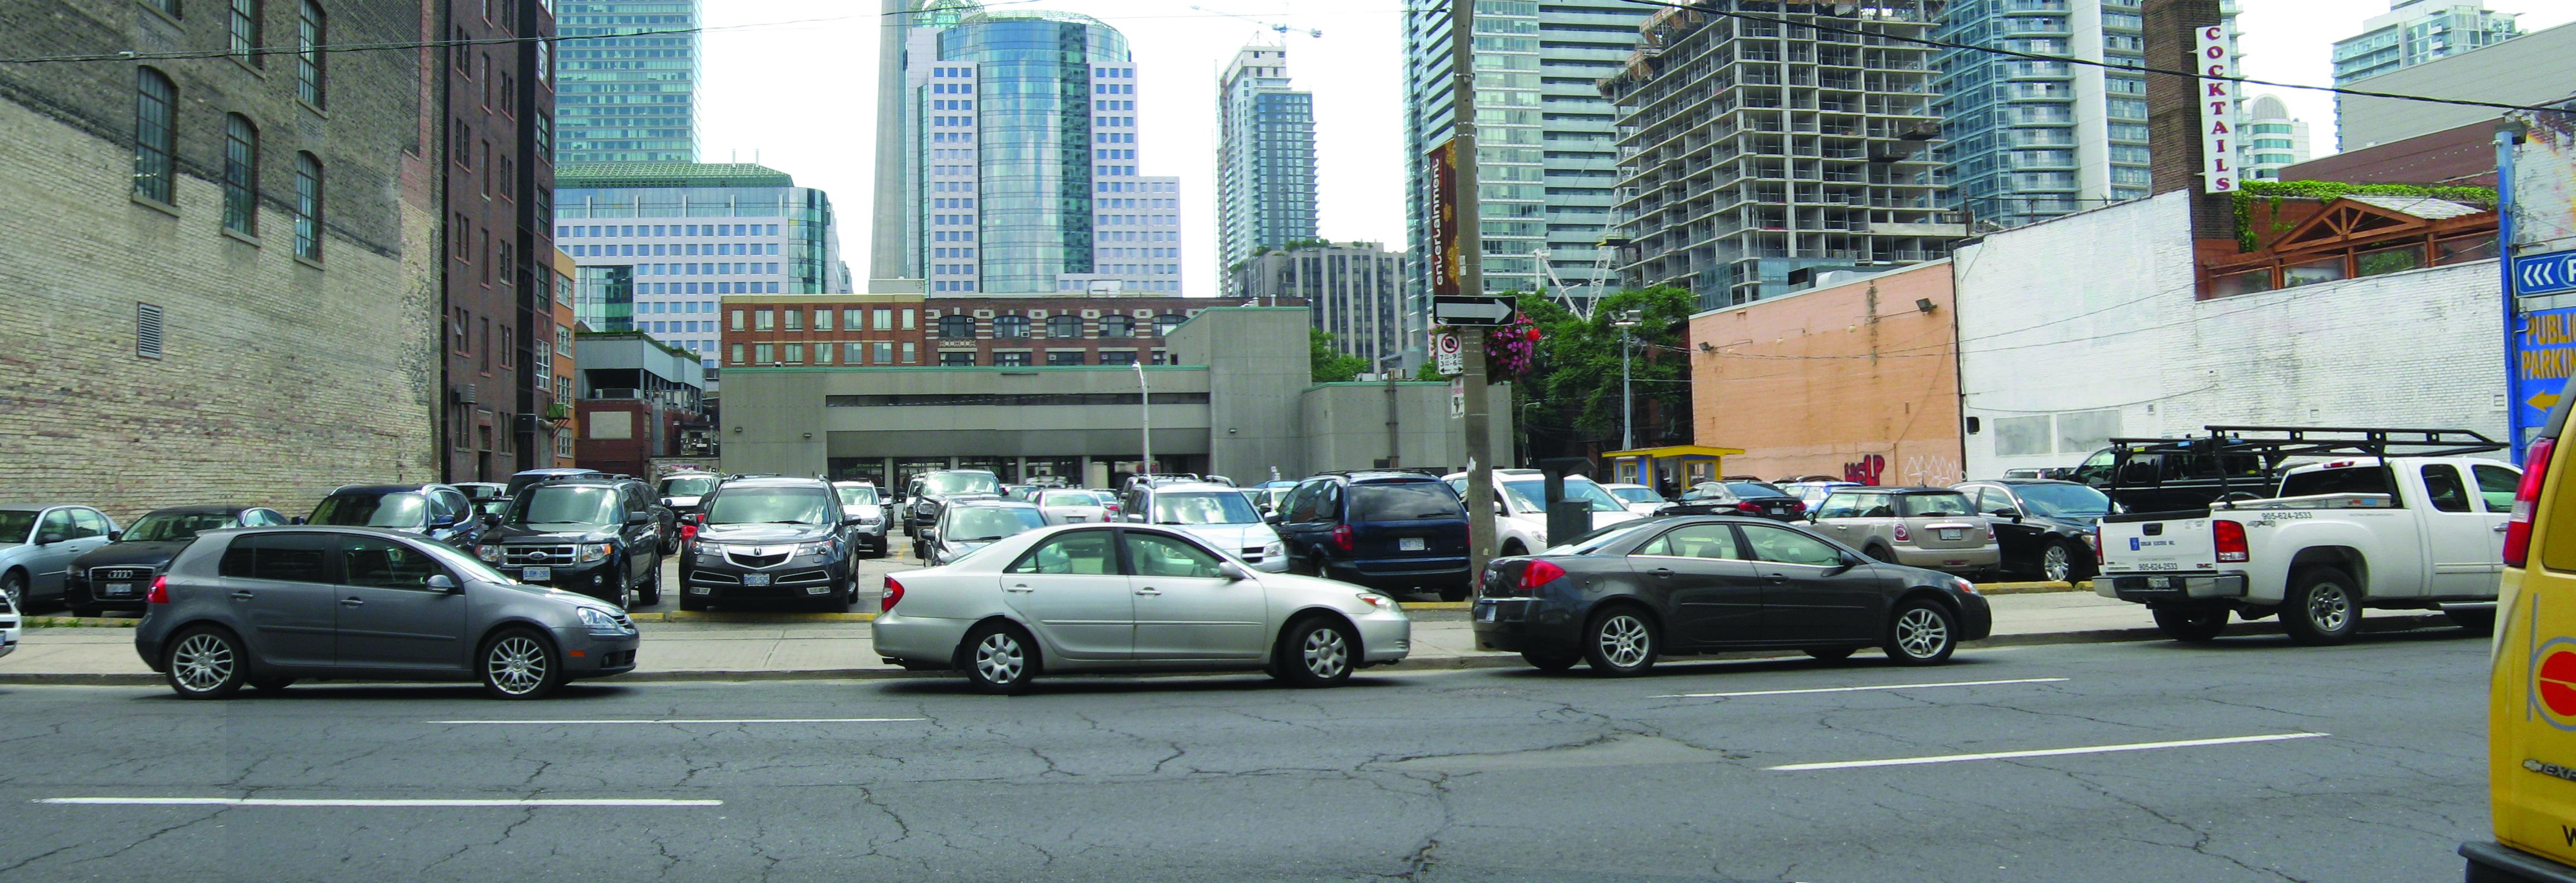 229 Richmond St W/260 Adelaide St W, Toronto. CentreCourt.